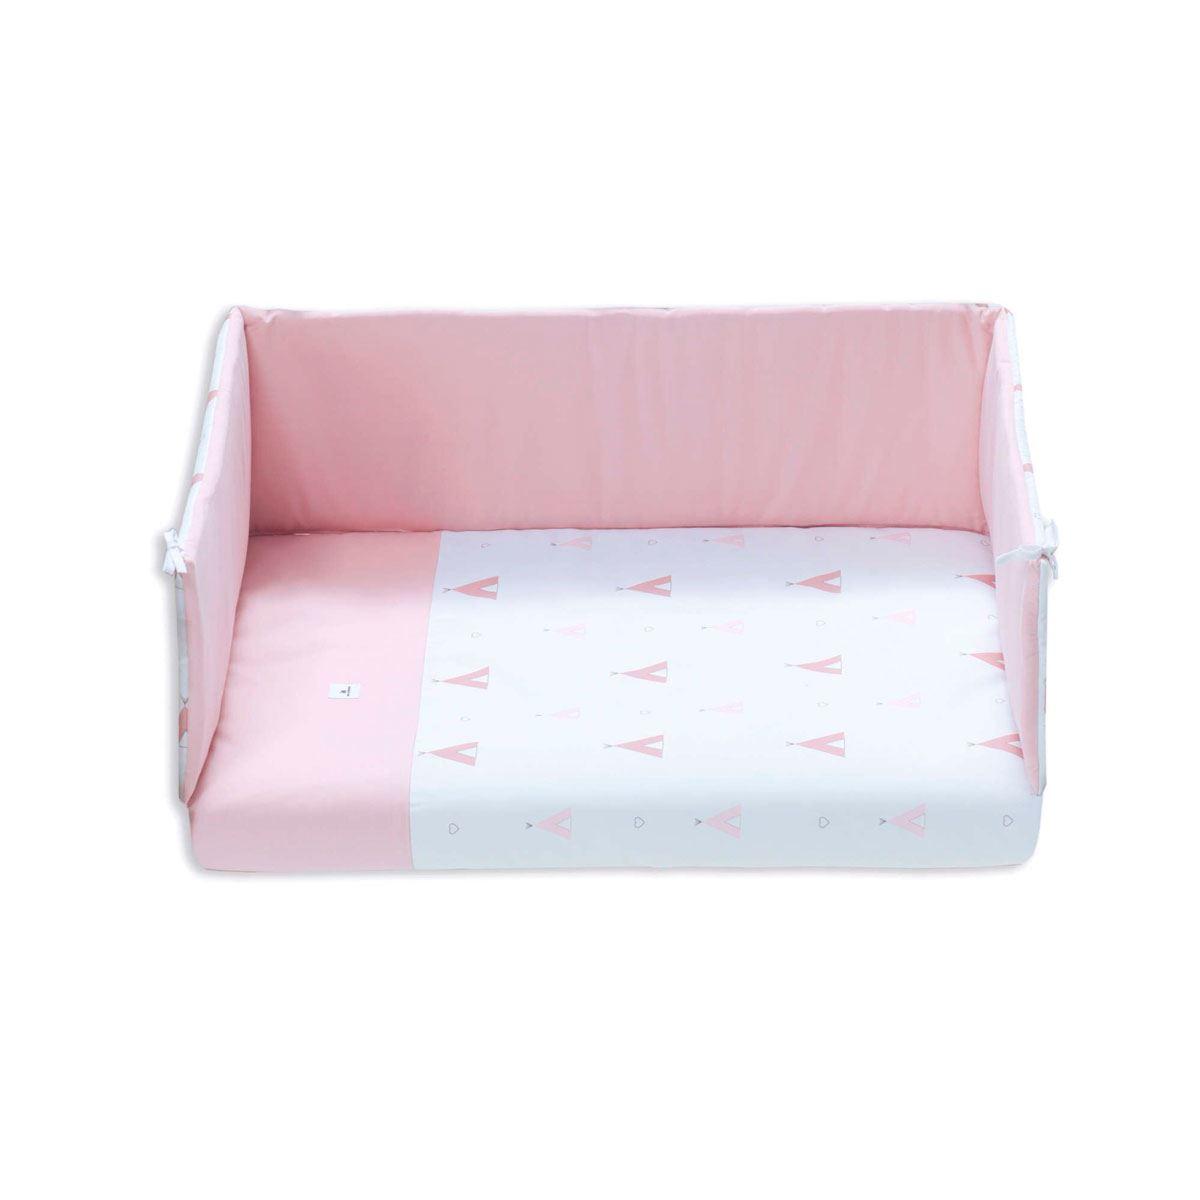 Textil y colchon Minicuna Equo Colecho Alondra 5 en 1 Rosa